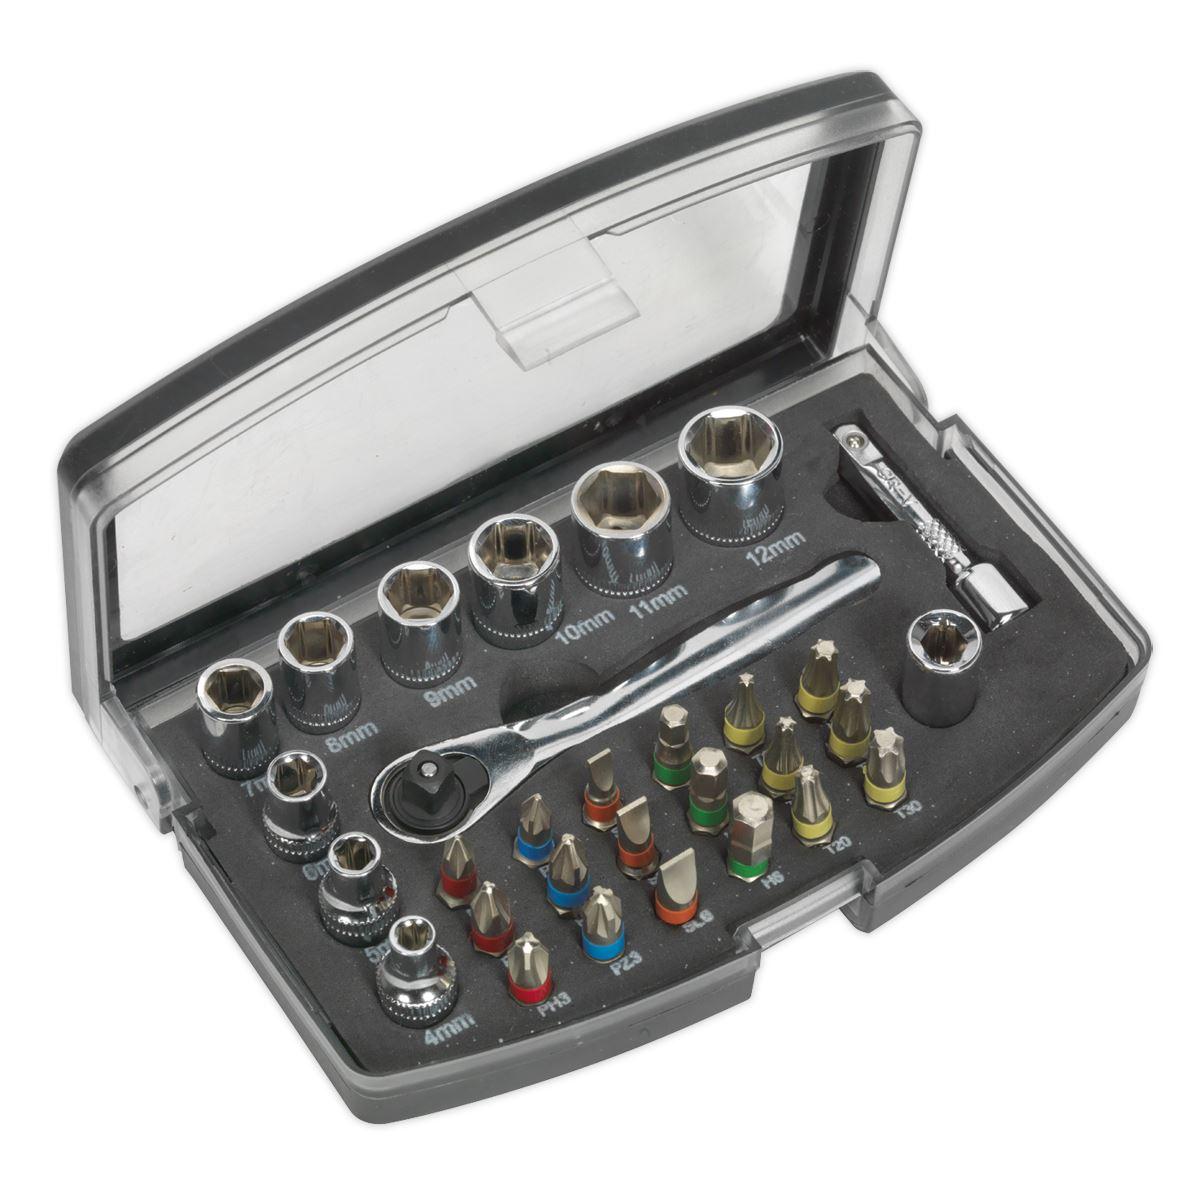 "Sealey SH1414HV Socket Holder 1//4/""Sq Drive 4-15mm Hi-Vis Green"